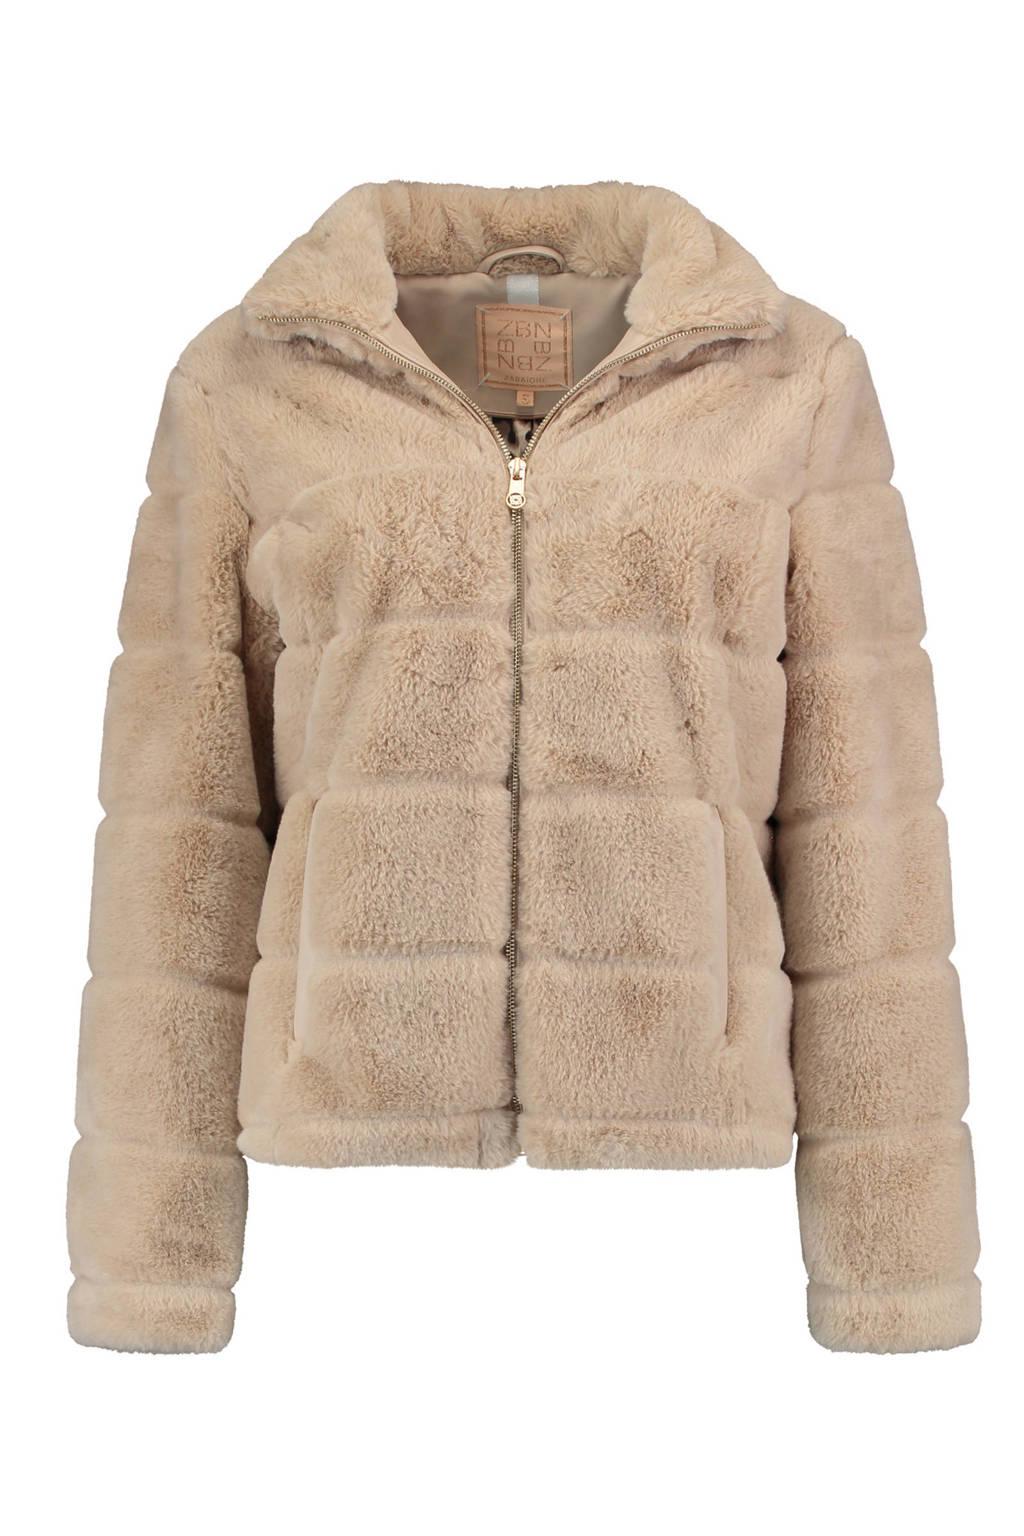 Zabaione jack Jacket Amber bruin, Bruin